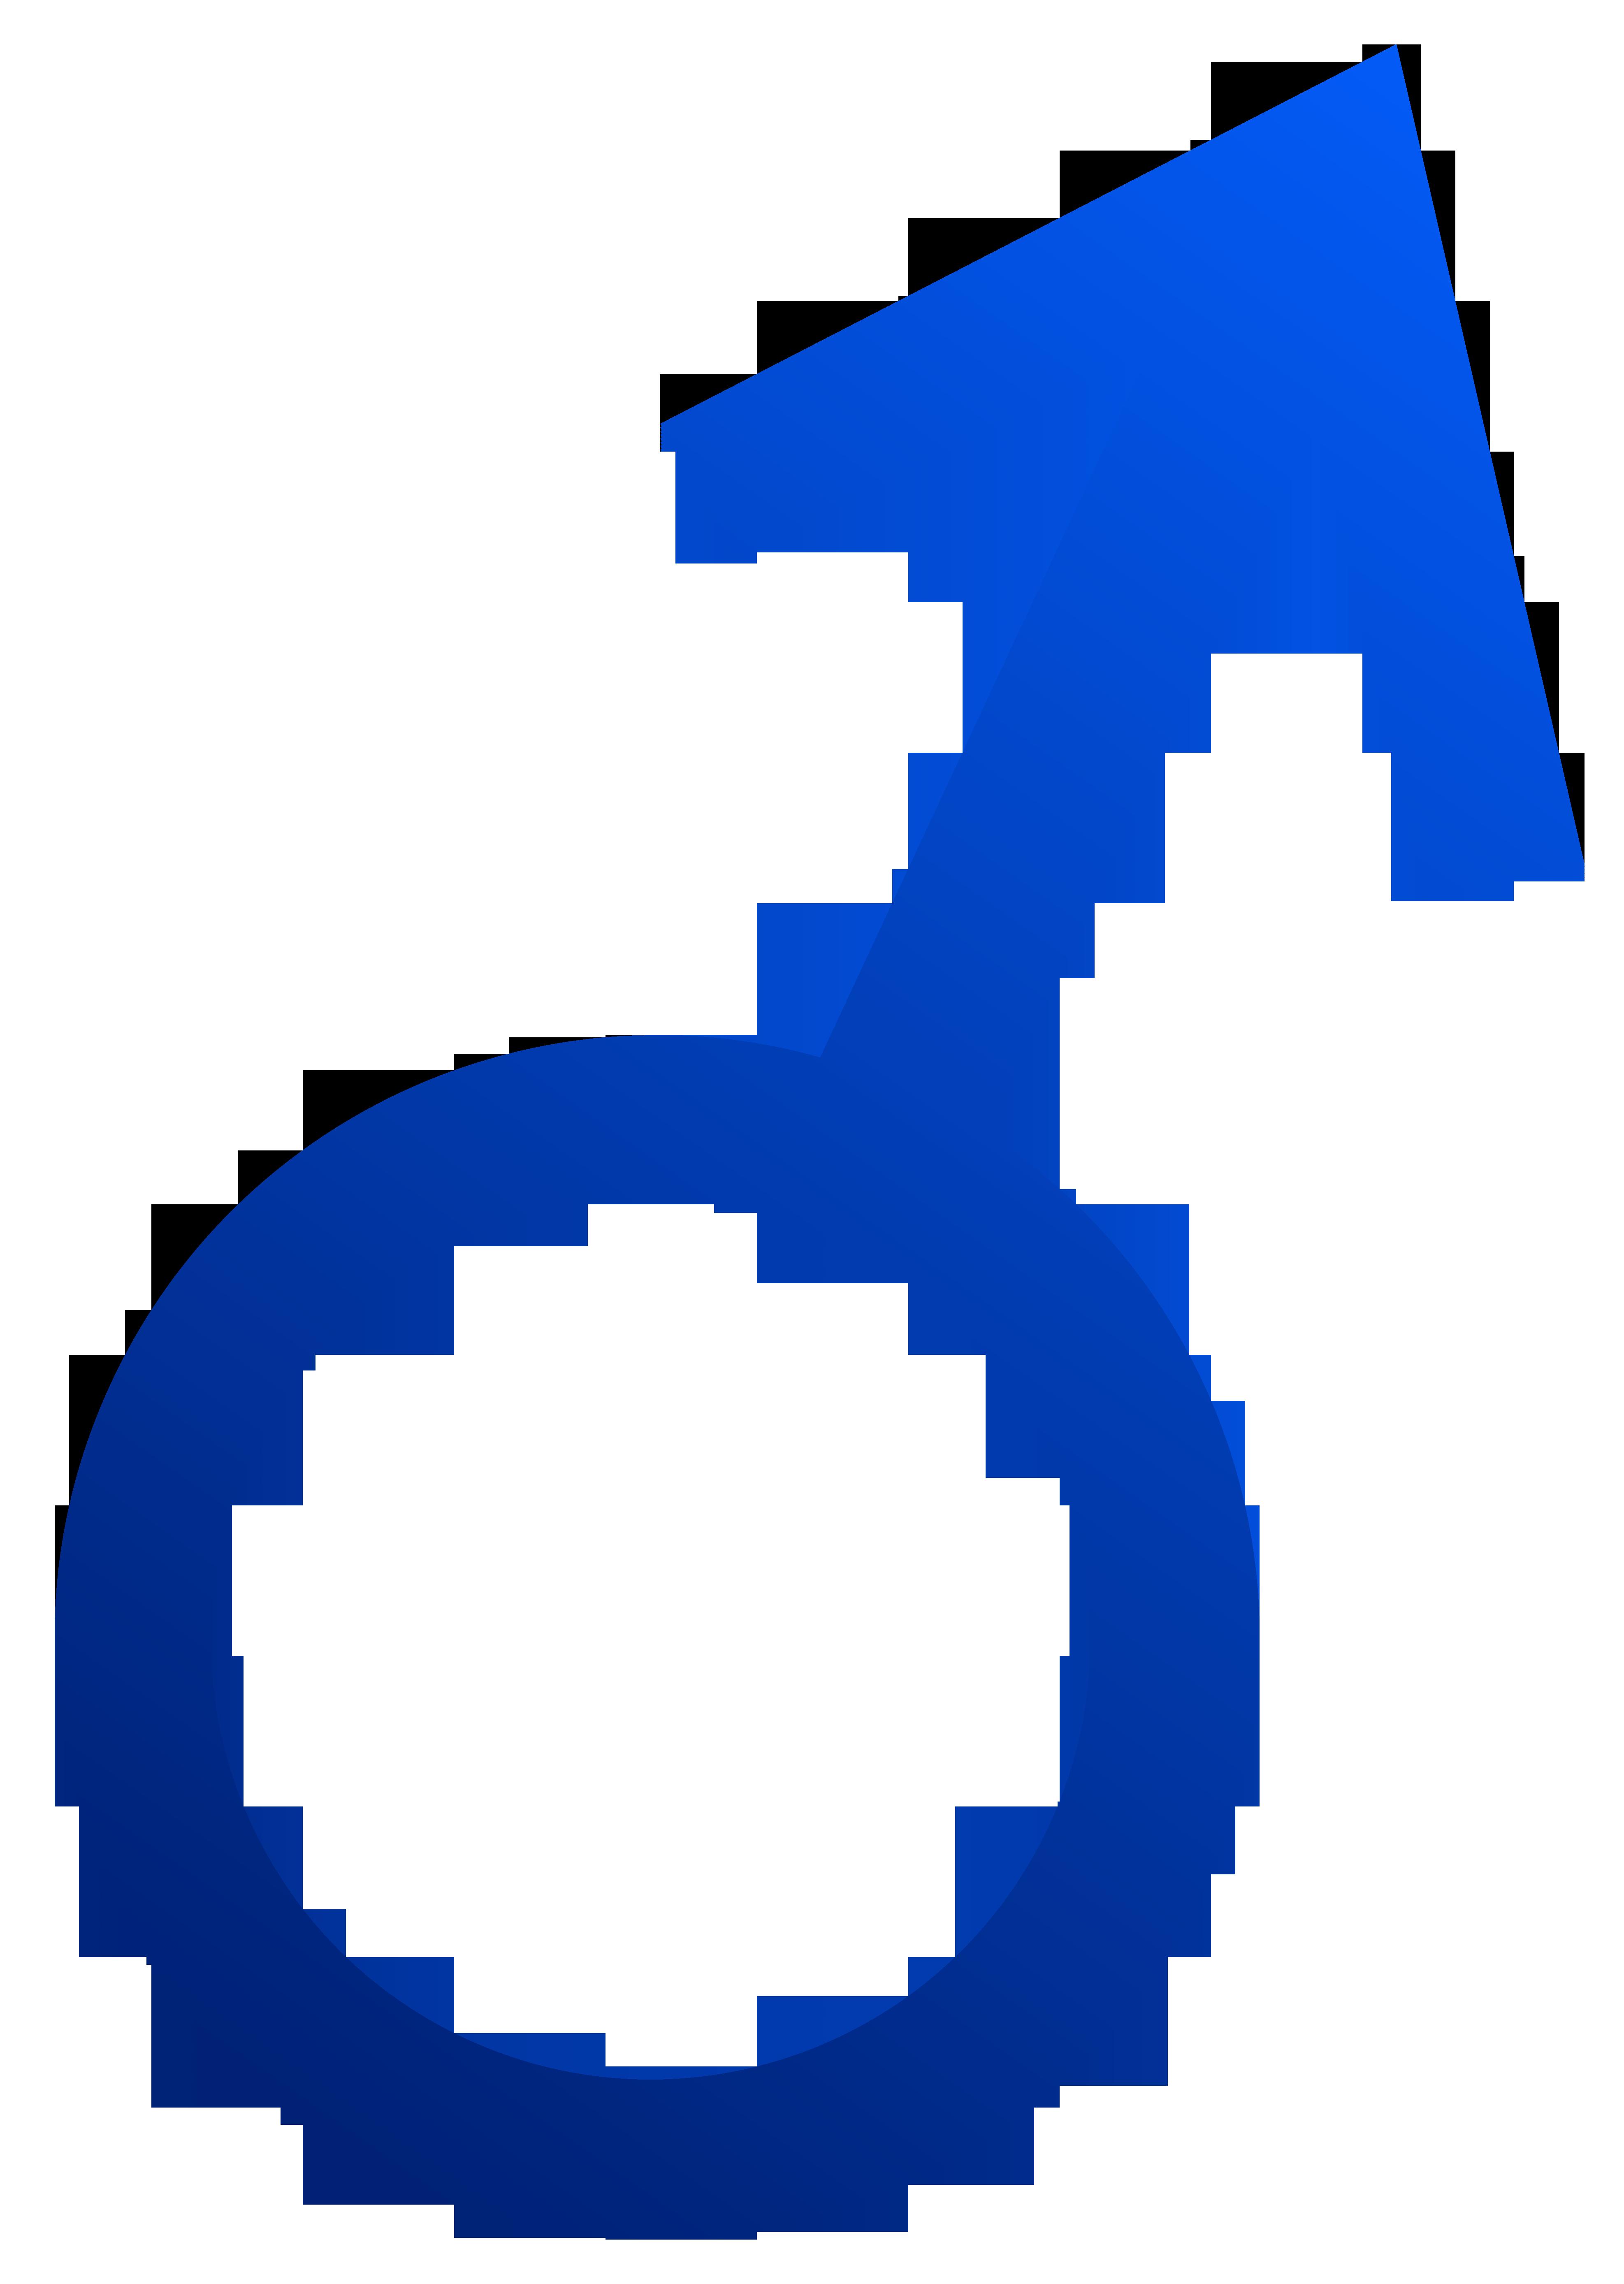 clipart download Male Symbol Blue Clip Art